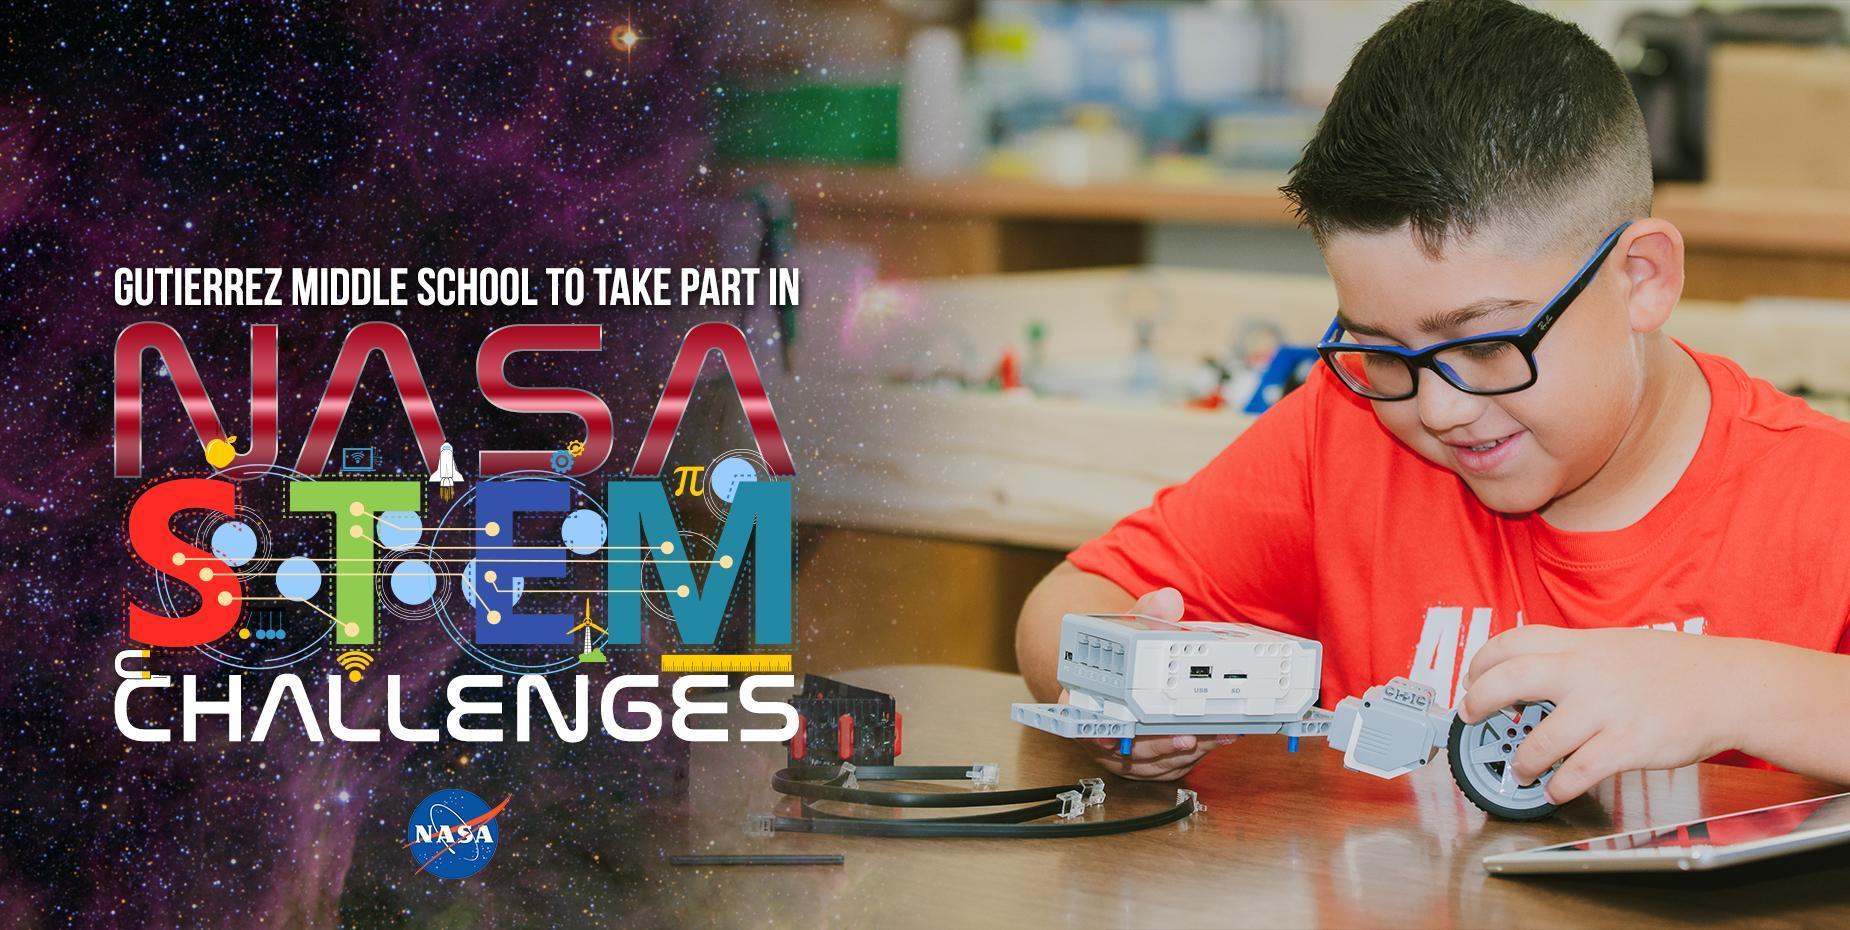 Gutierrez Middle School to take part in NASA STEM challenges